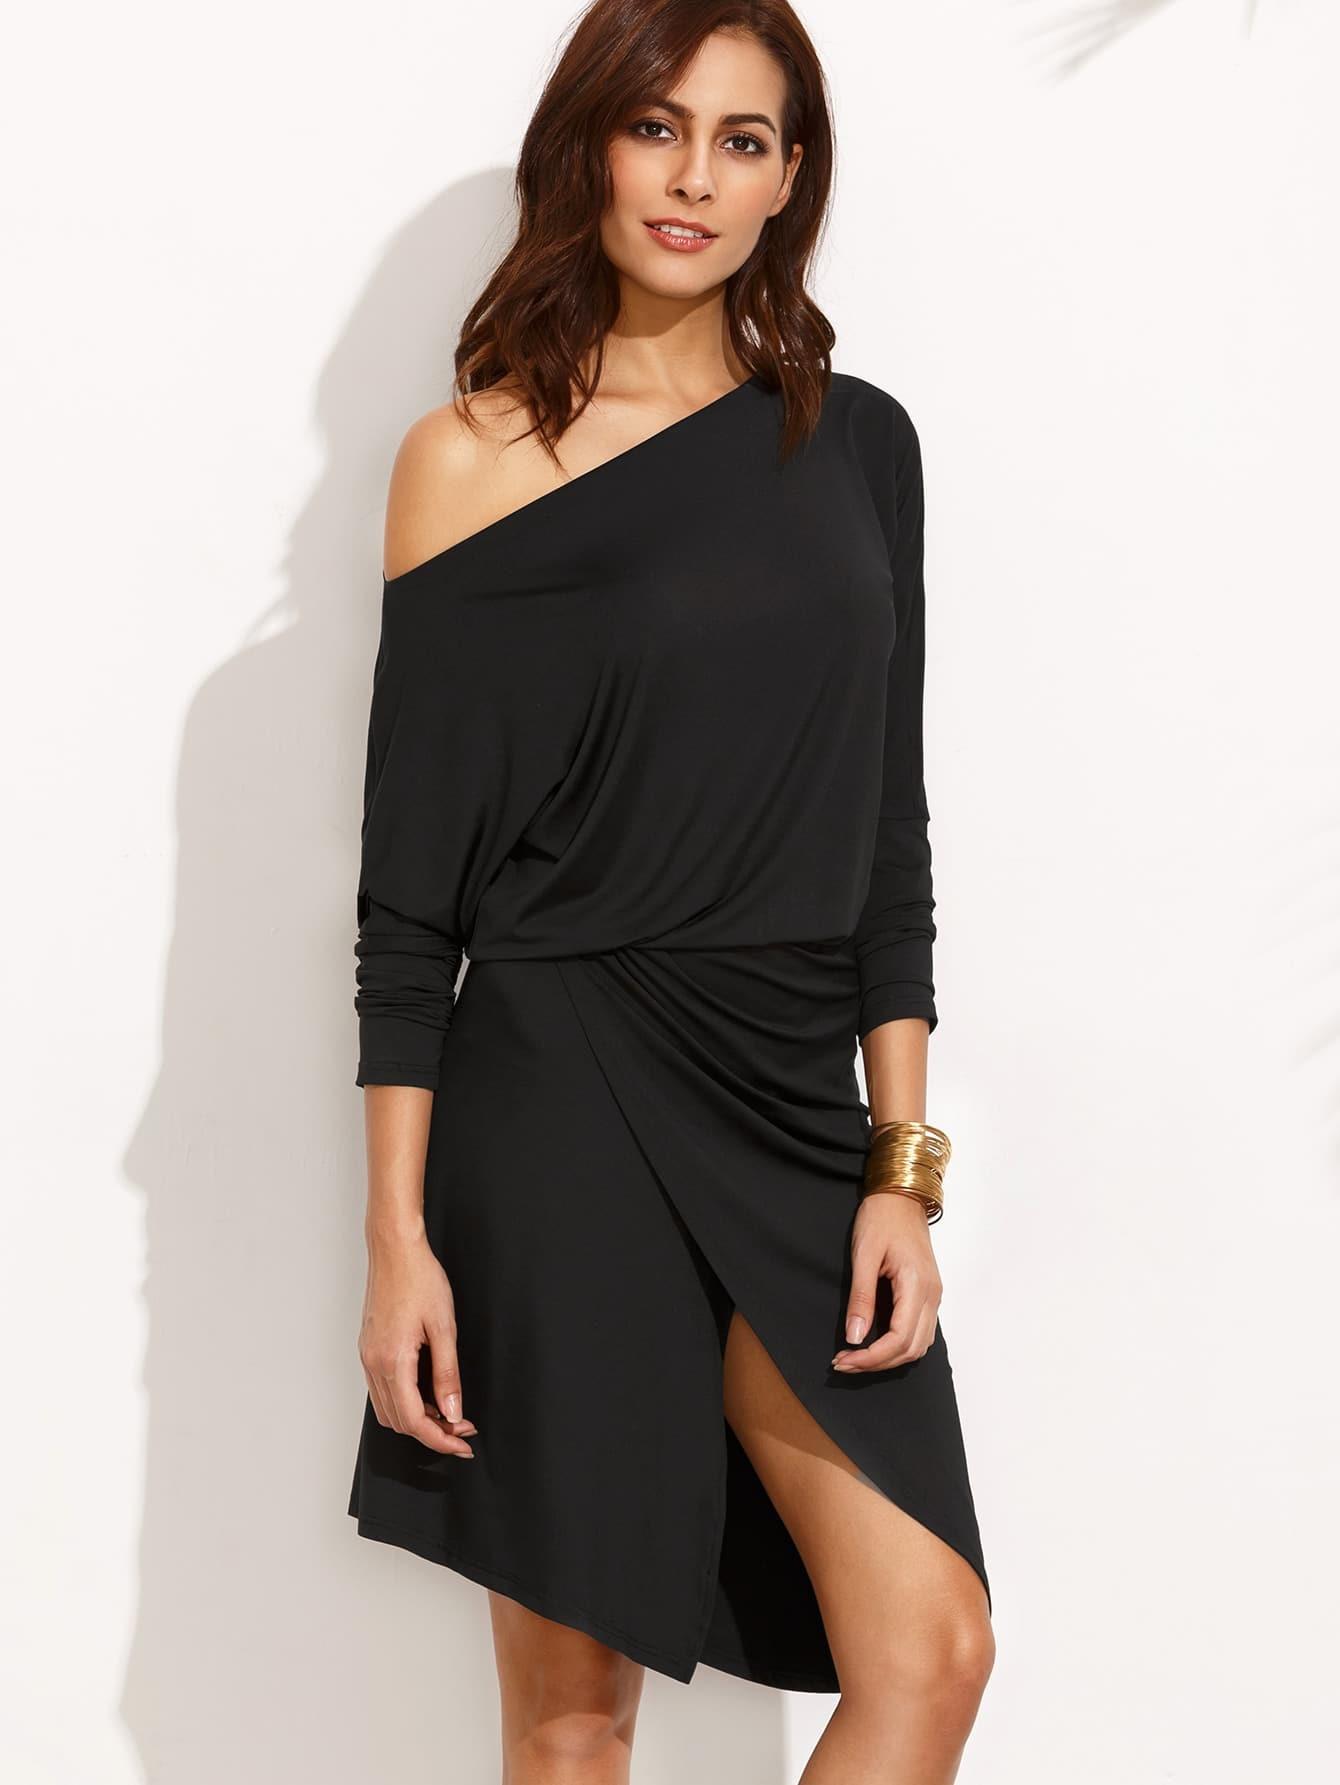 Black One Shoulder Asymmetrical Dress